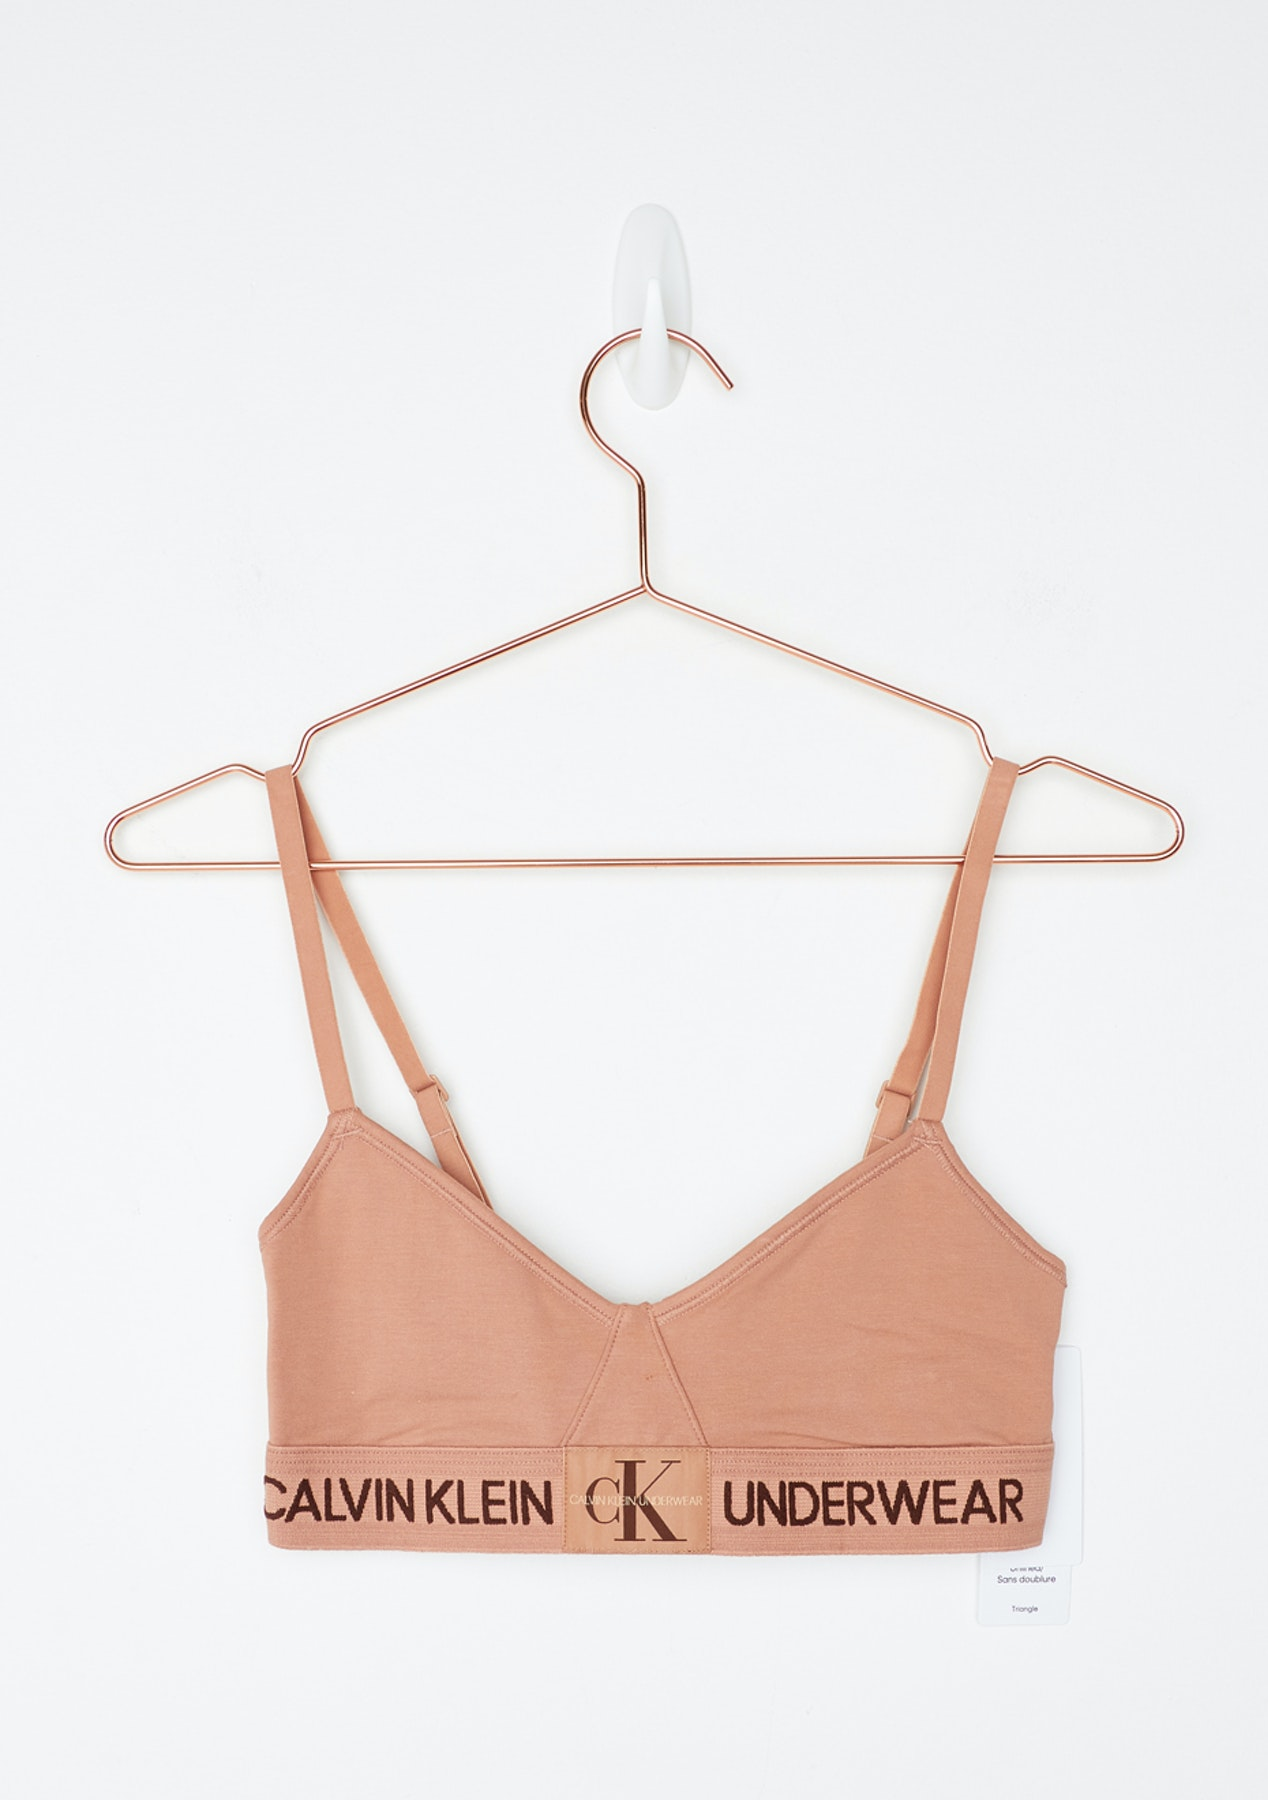 f0da35efc41 Calvin Klein - Monogram Unlined Triangle - Unity - Free Shipping Calvin  Klein - Onceit